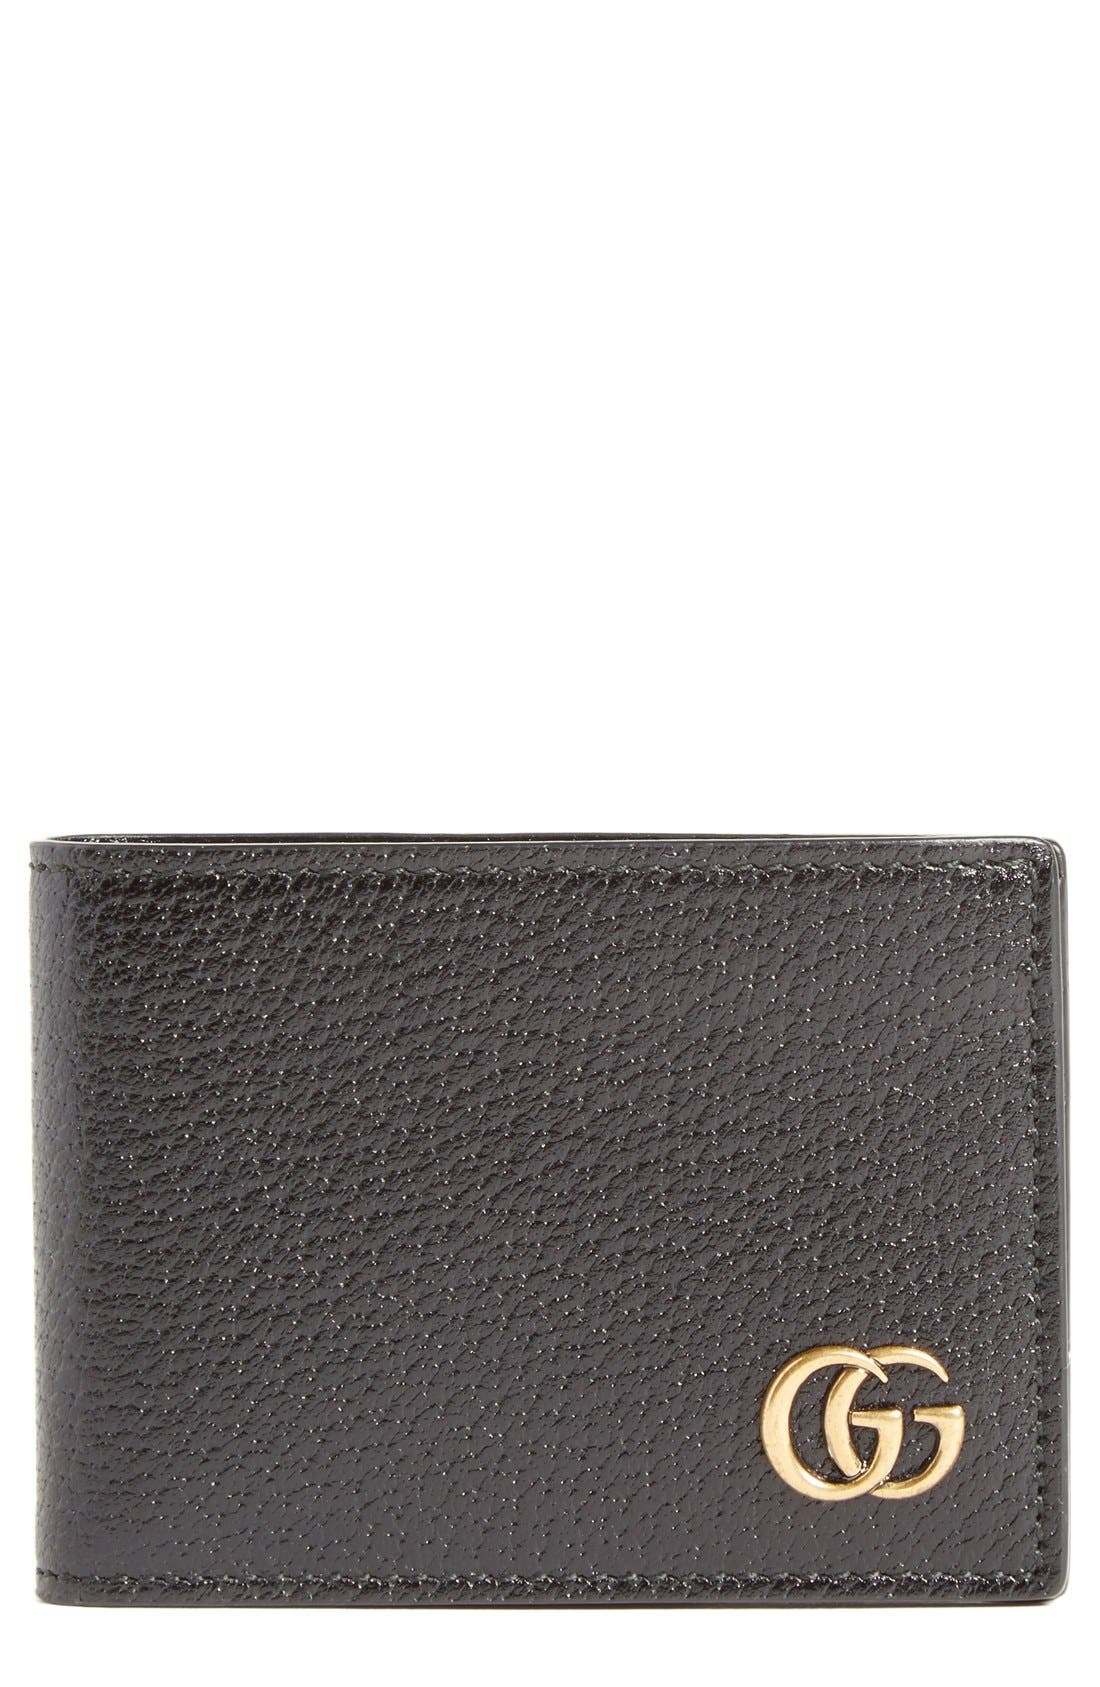 Marmont Leather Wallet,                         Main,                         color, Black